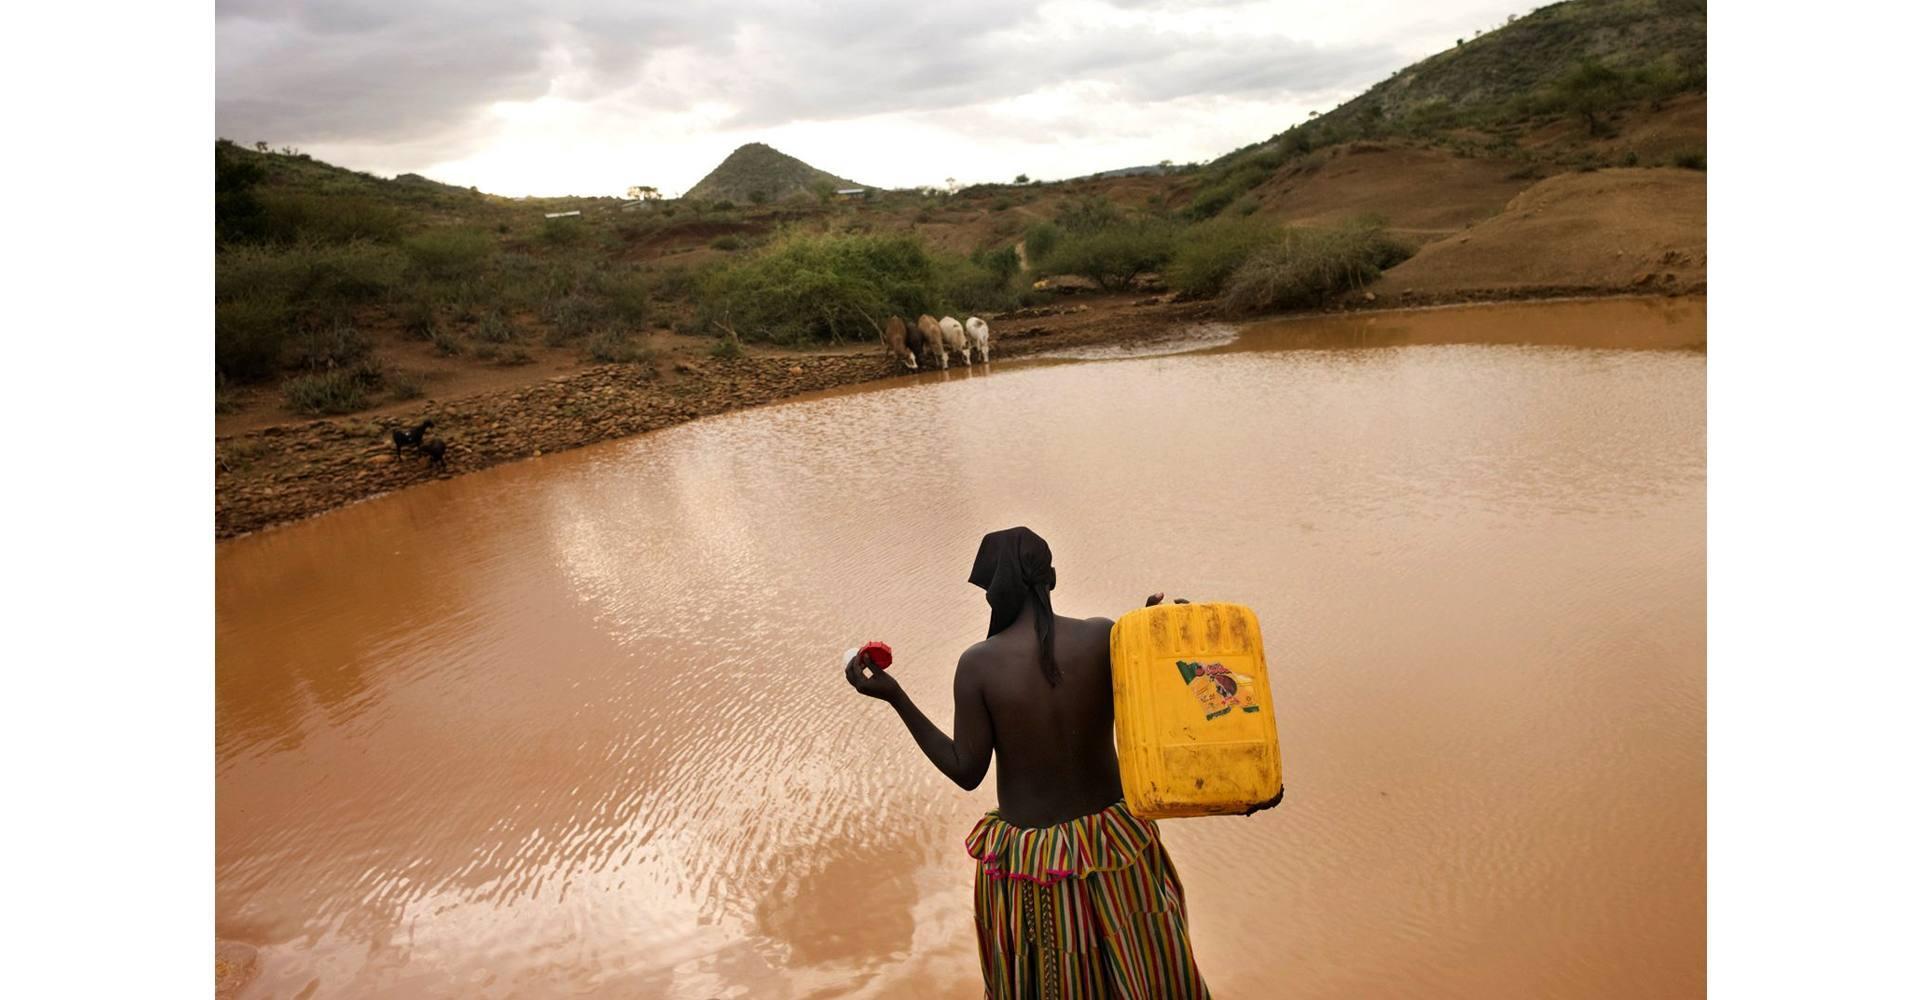 Shekana, Ethiopia